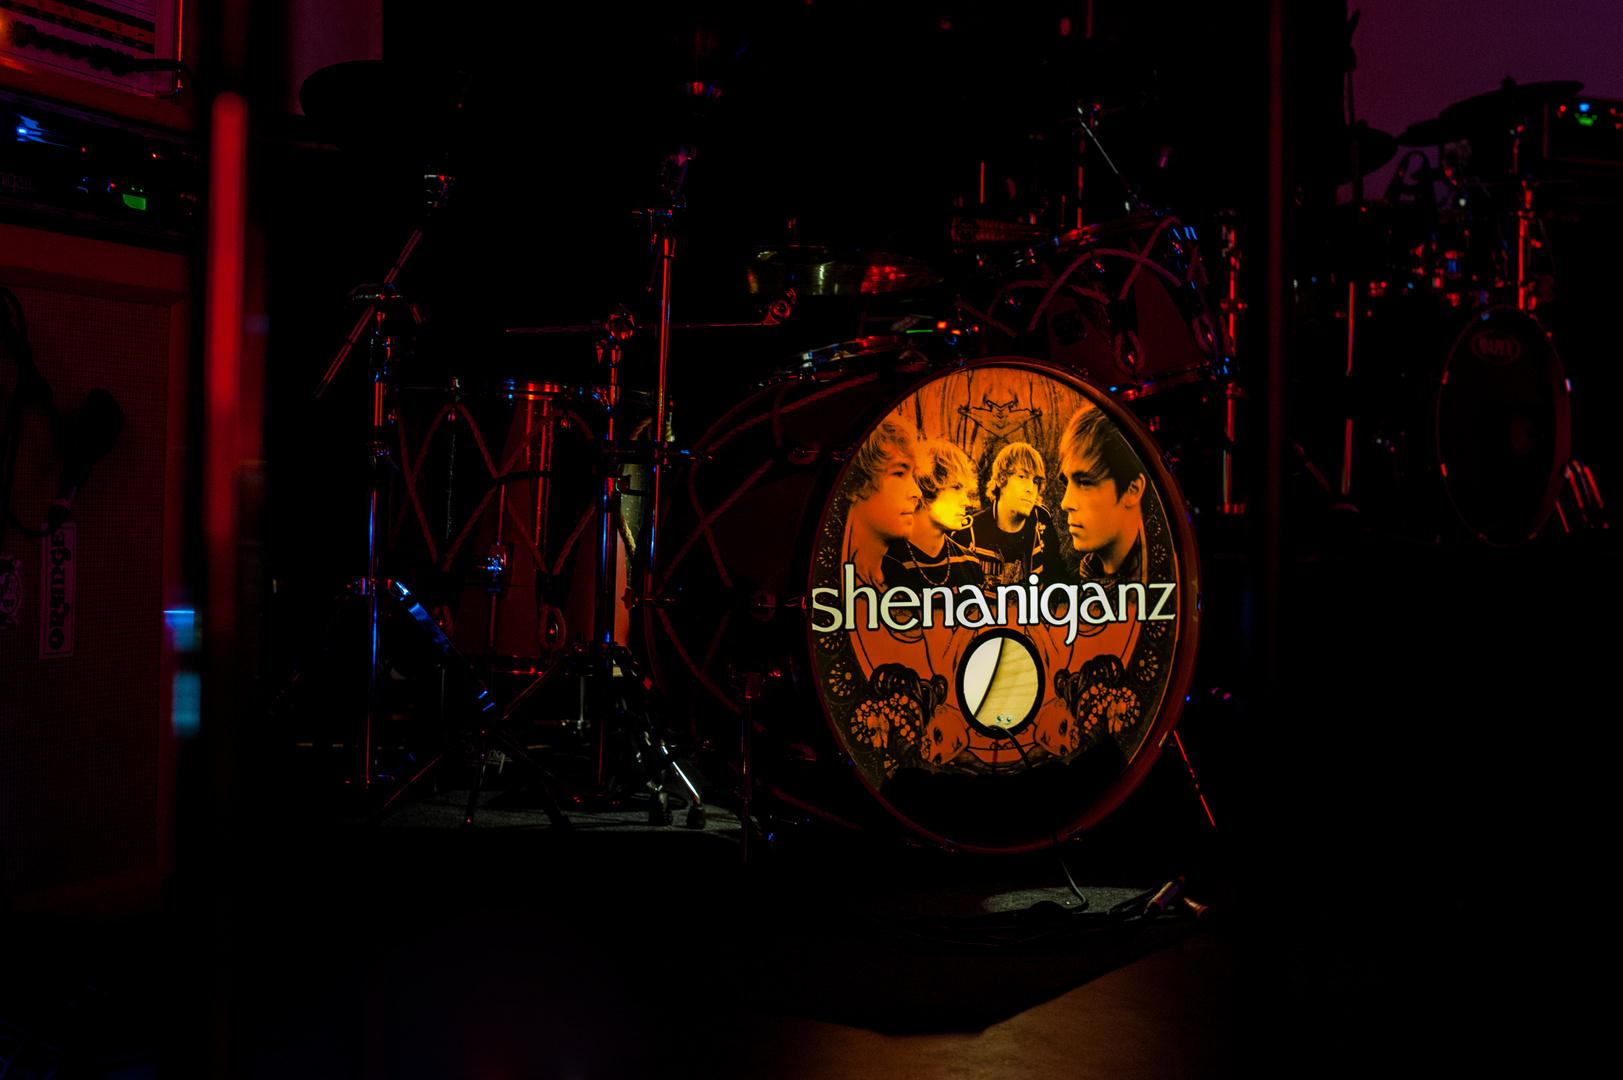 Shenaniganz - Live on stage